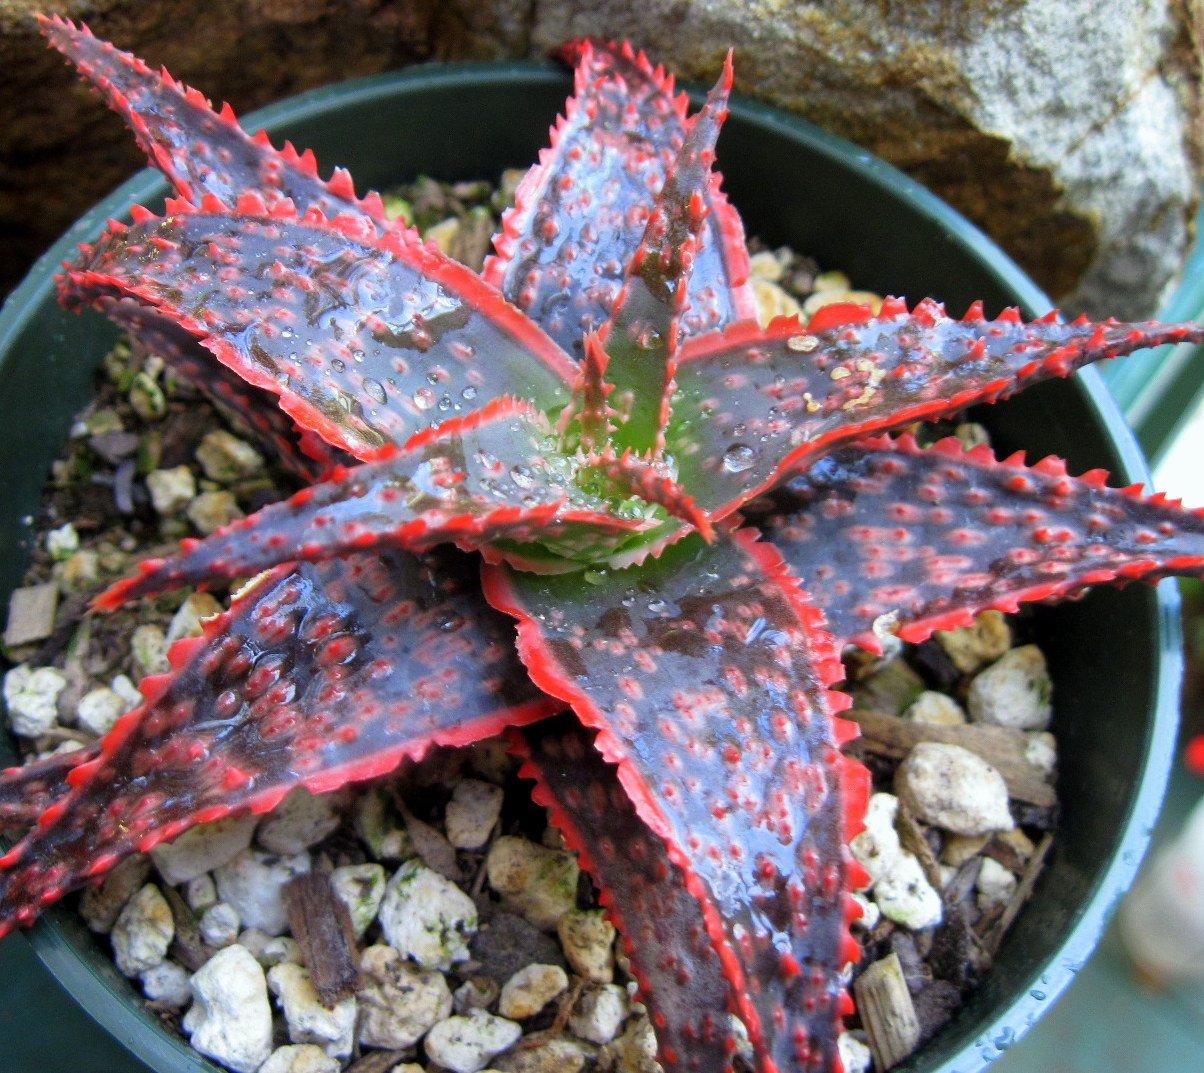 Amazon.com : Heirloom 10 Seeds Aloe Christmas Carol @ Red Color ...